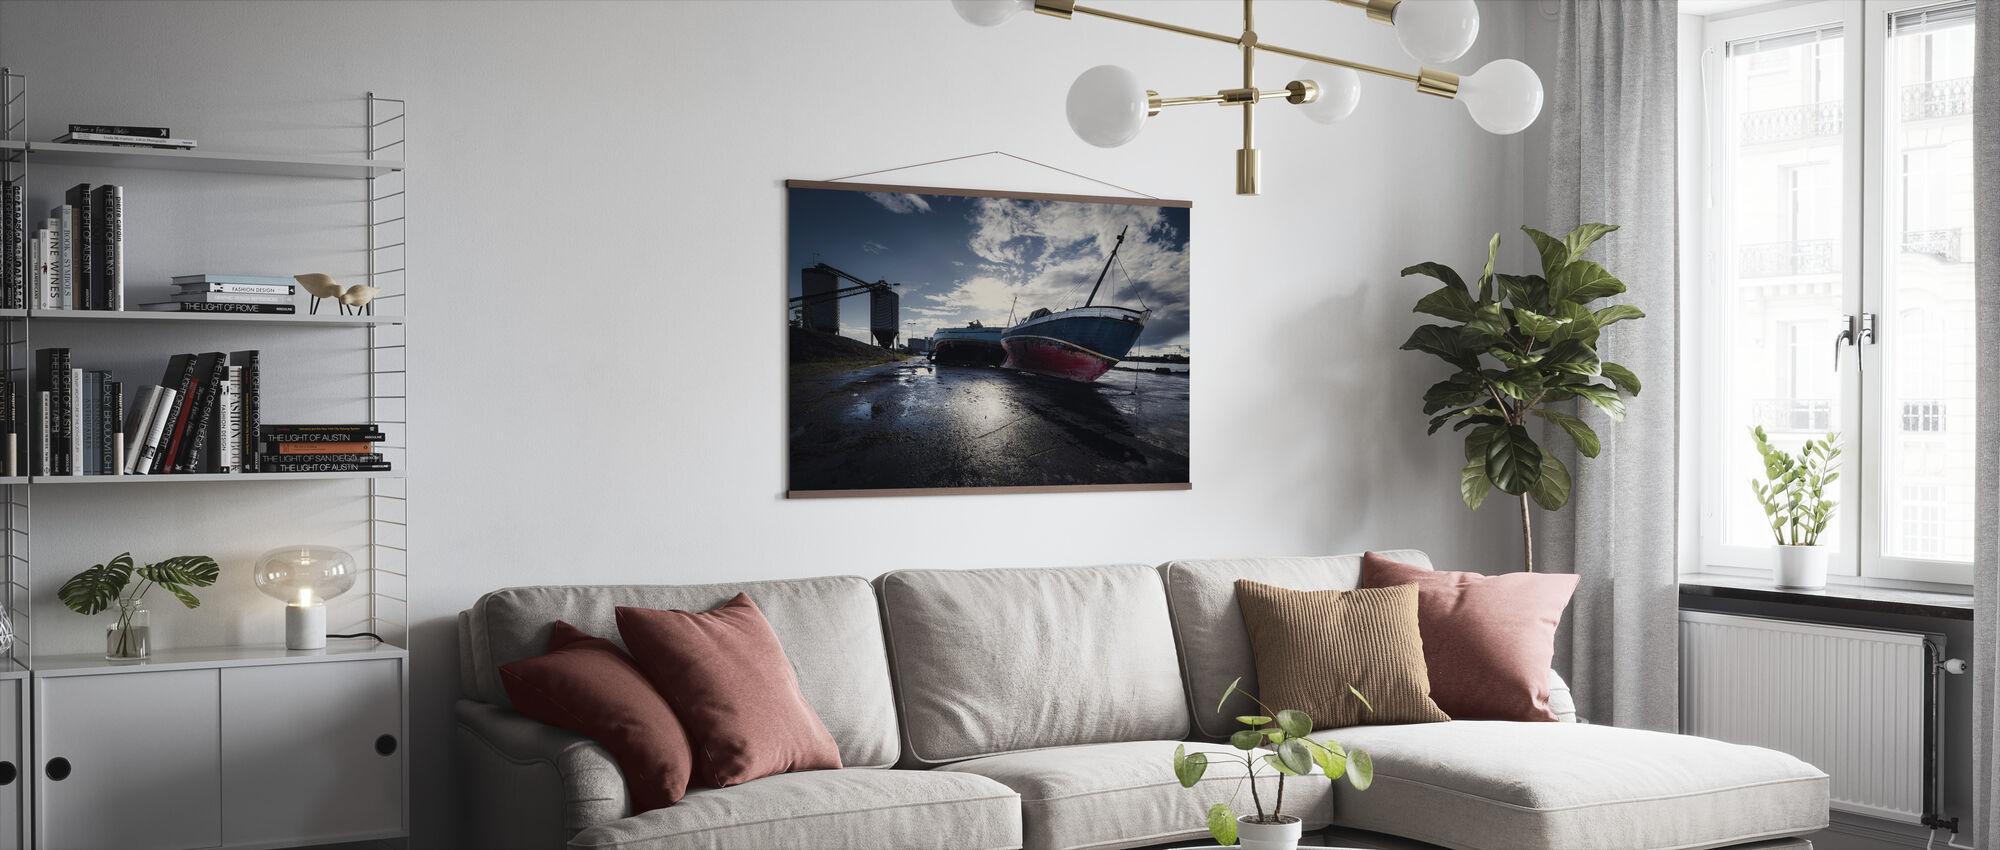 Stranded Boats in Malmö, Sweden - Poster - Living Room